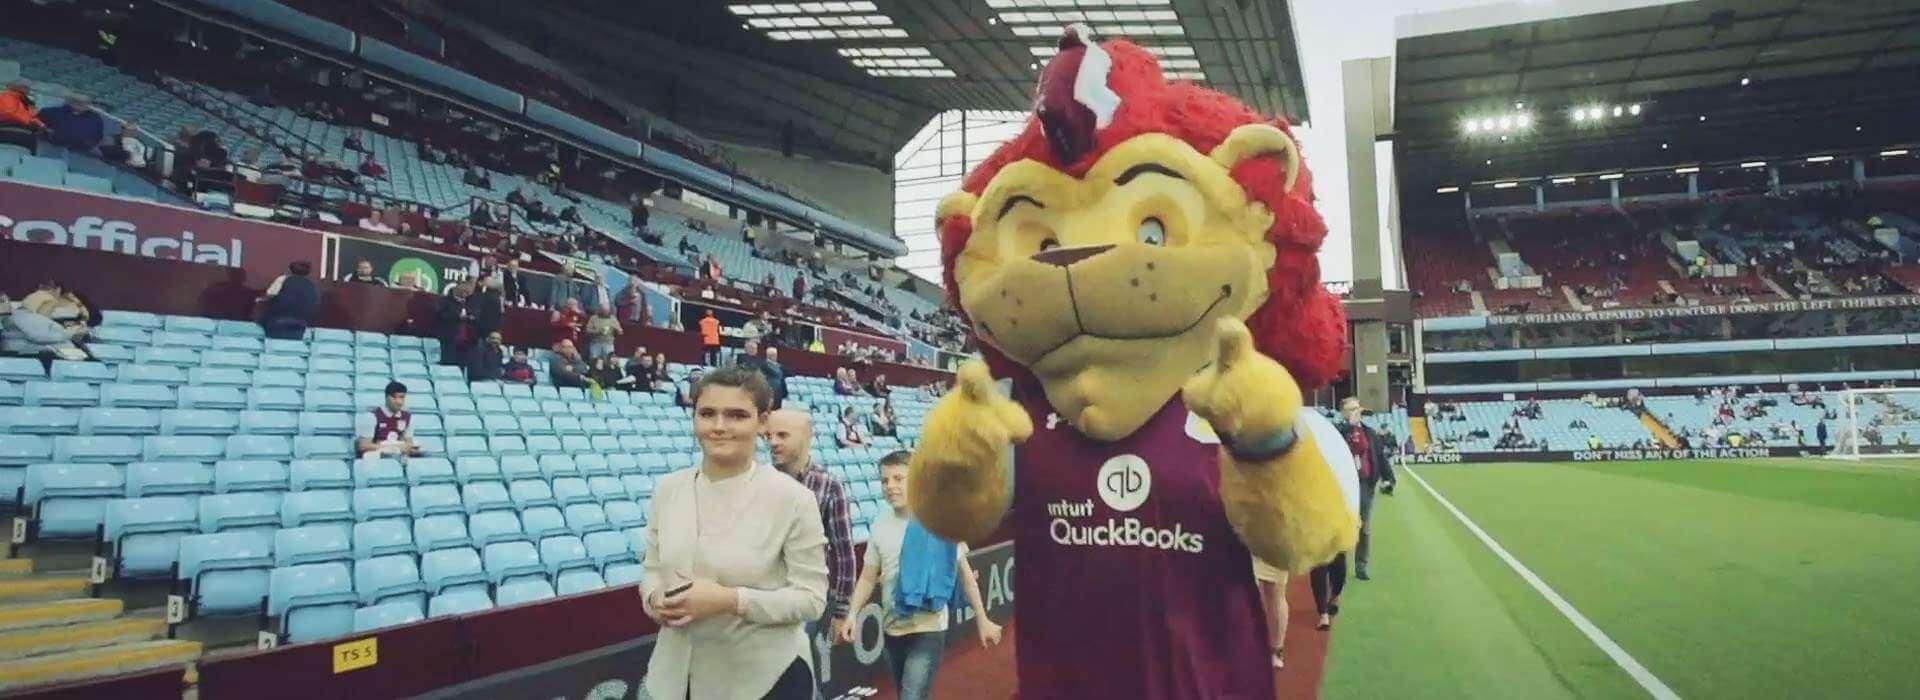 Bruce backs new signings to spark Villa revival